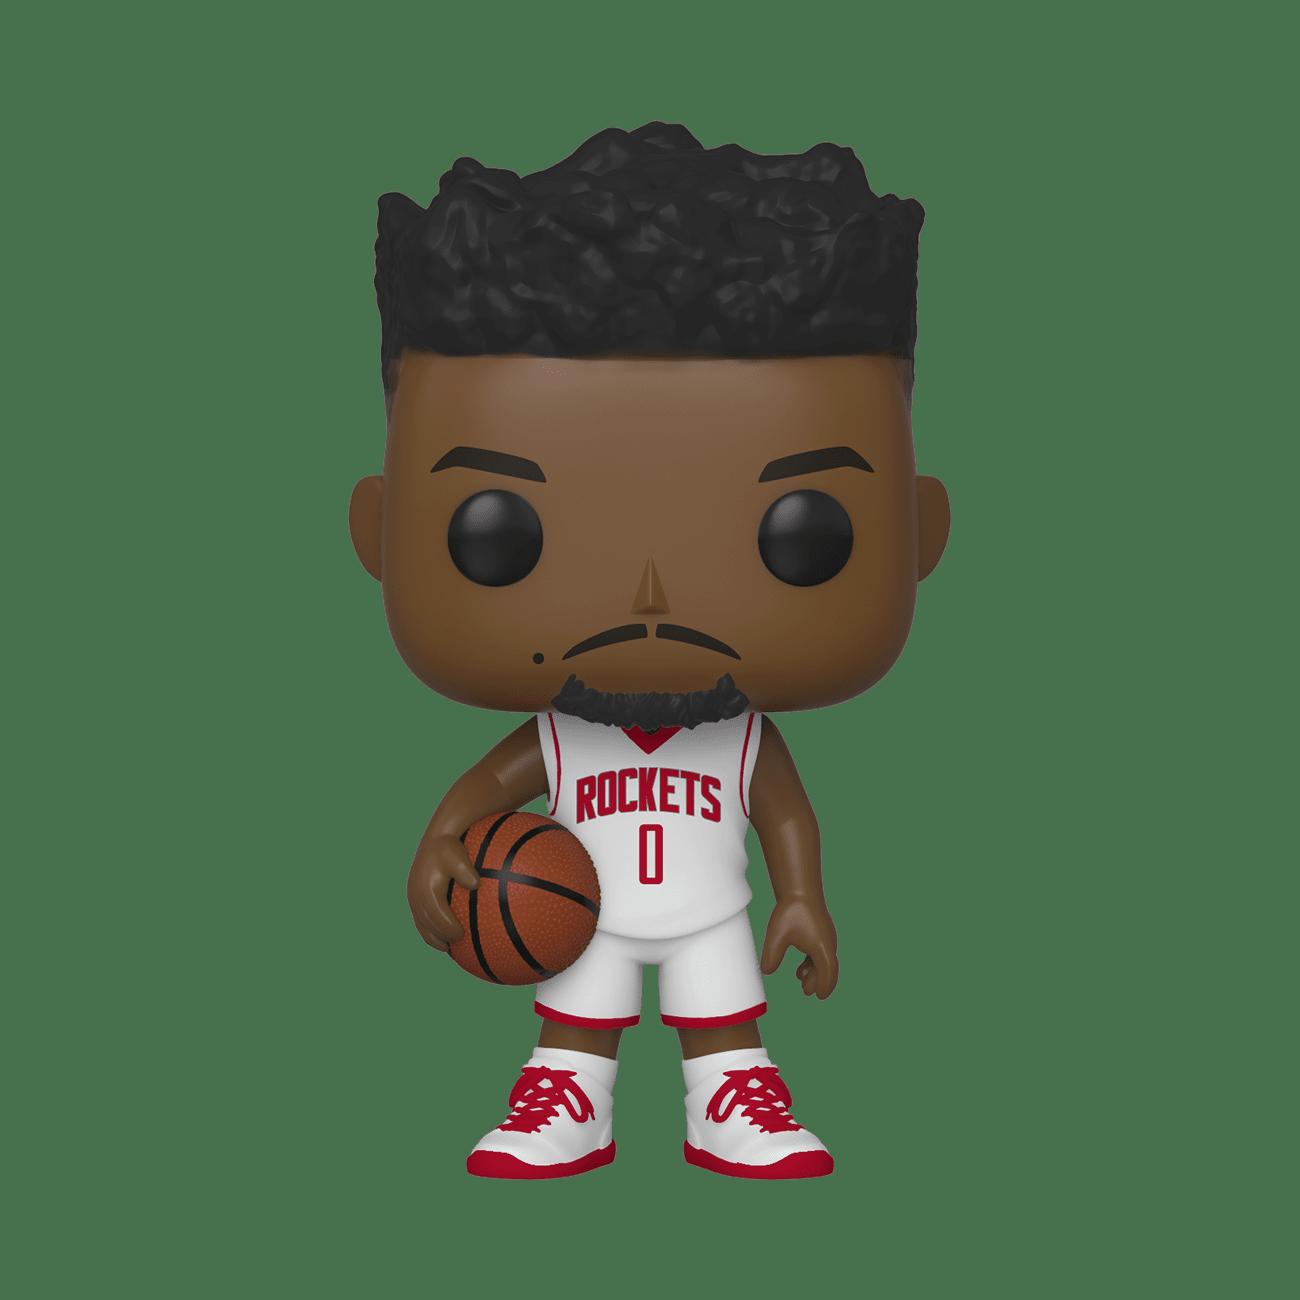 NBA: Rockets Russell Westbrook  POP! Vinyl Figure